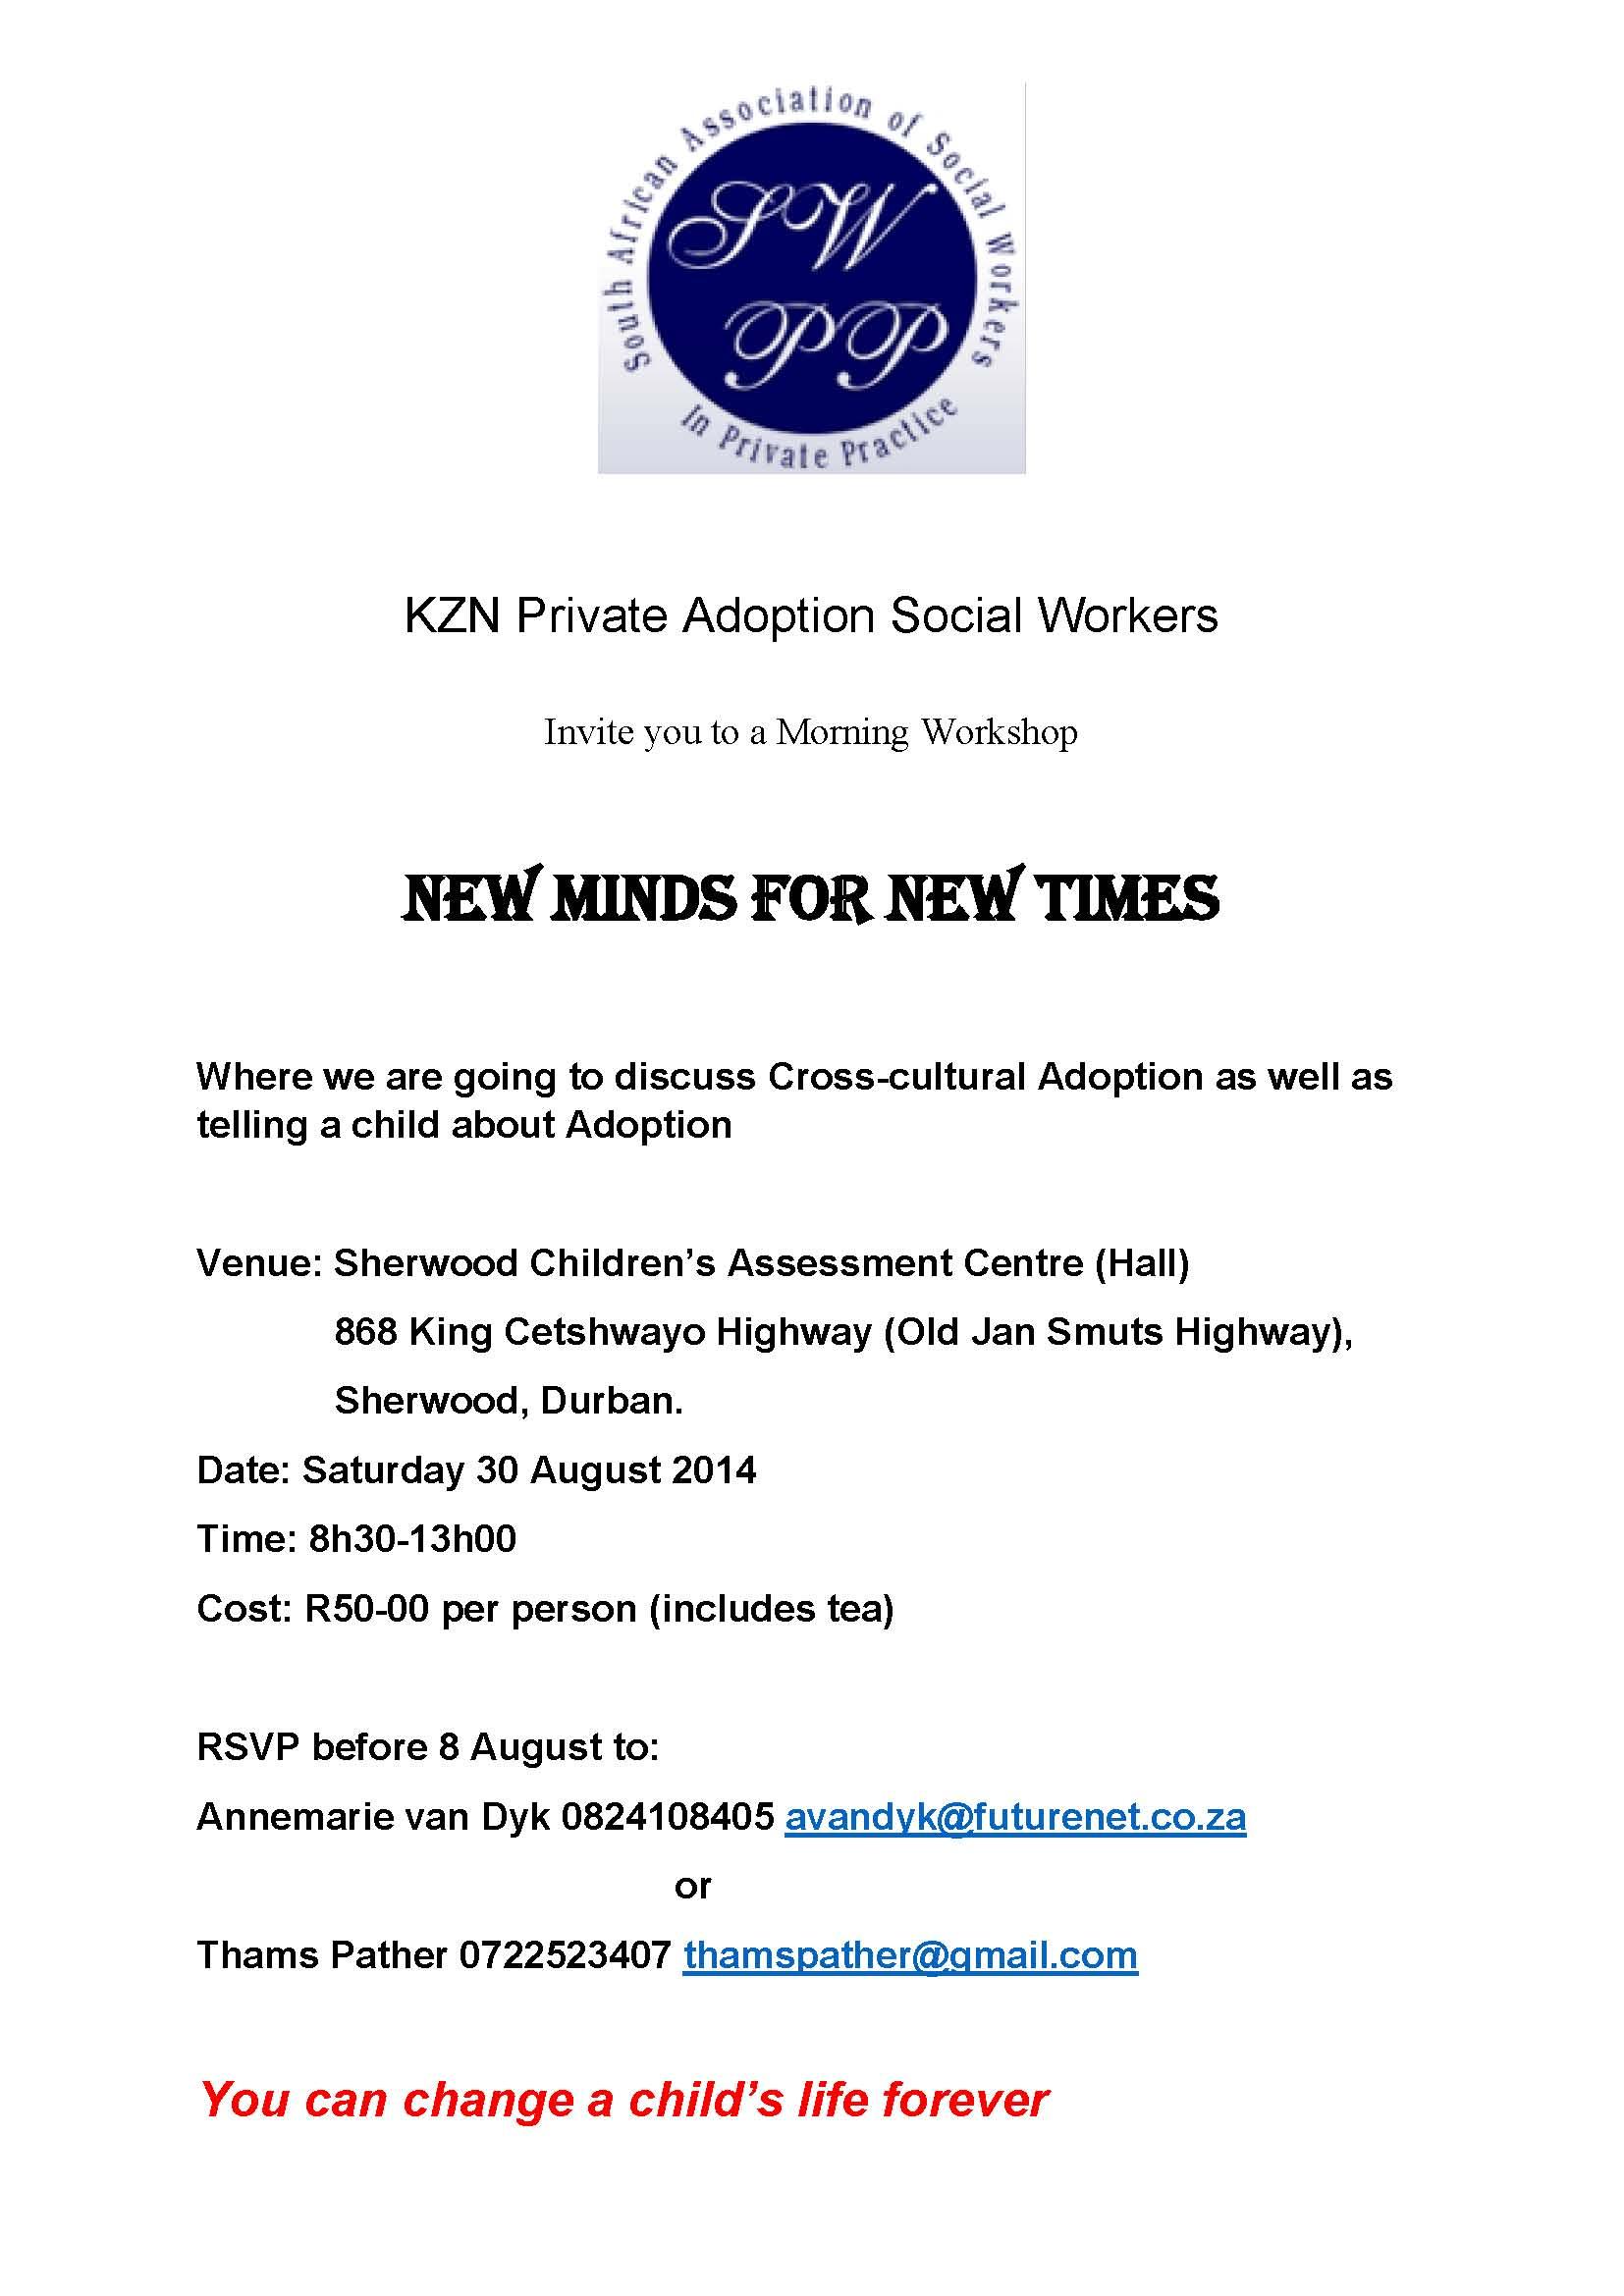 Invite to workshop